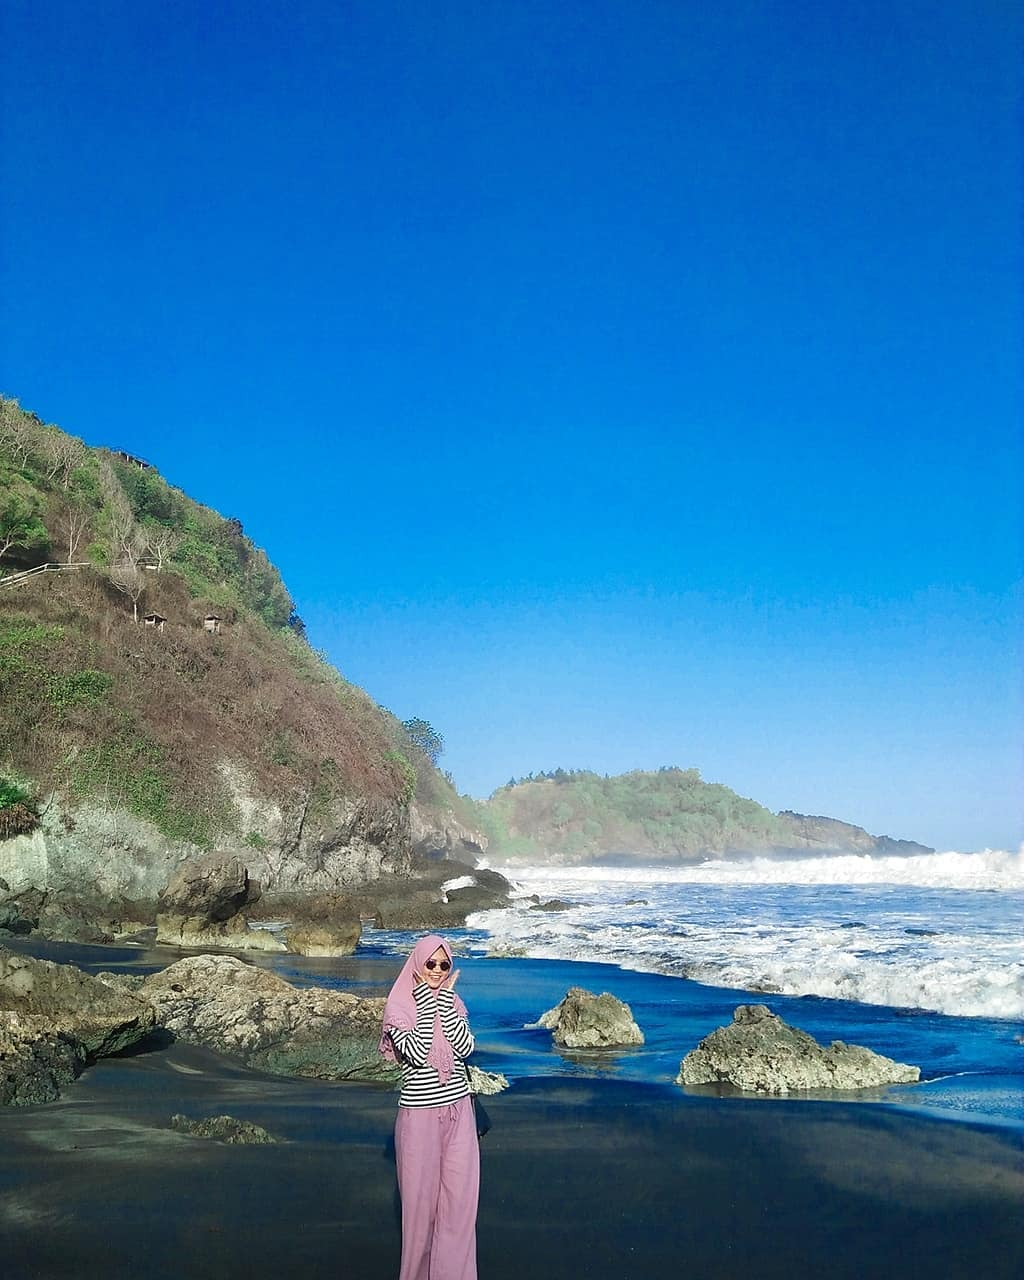 pesona keindahan pantai surumanis kebumen